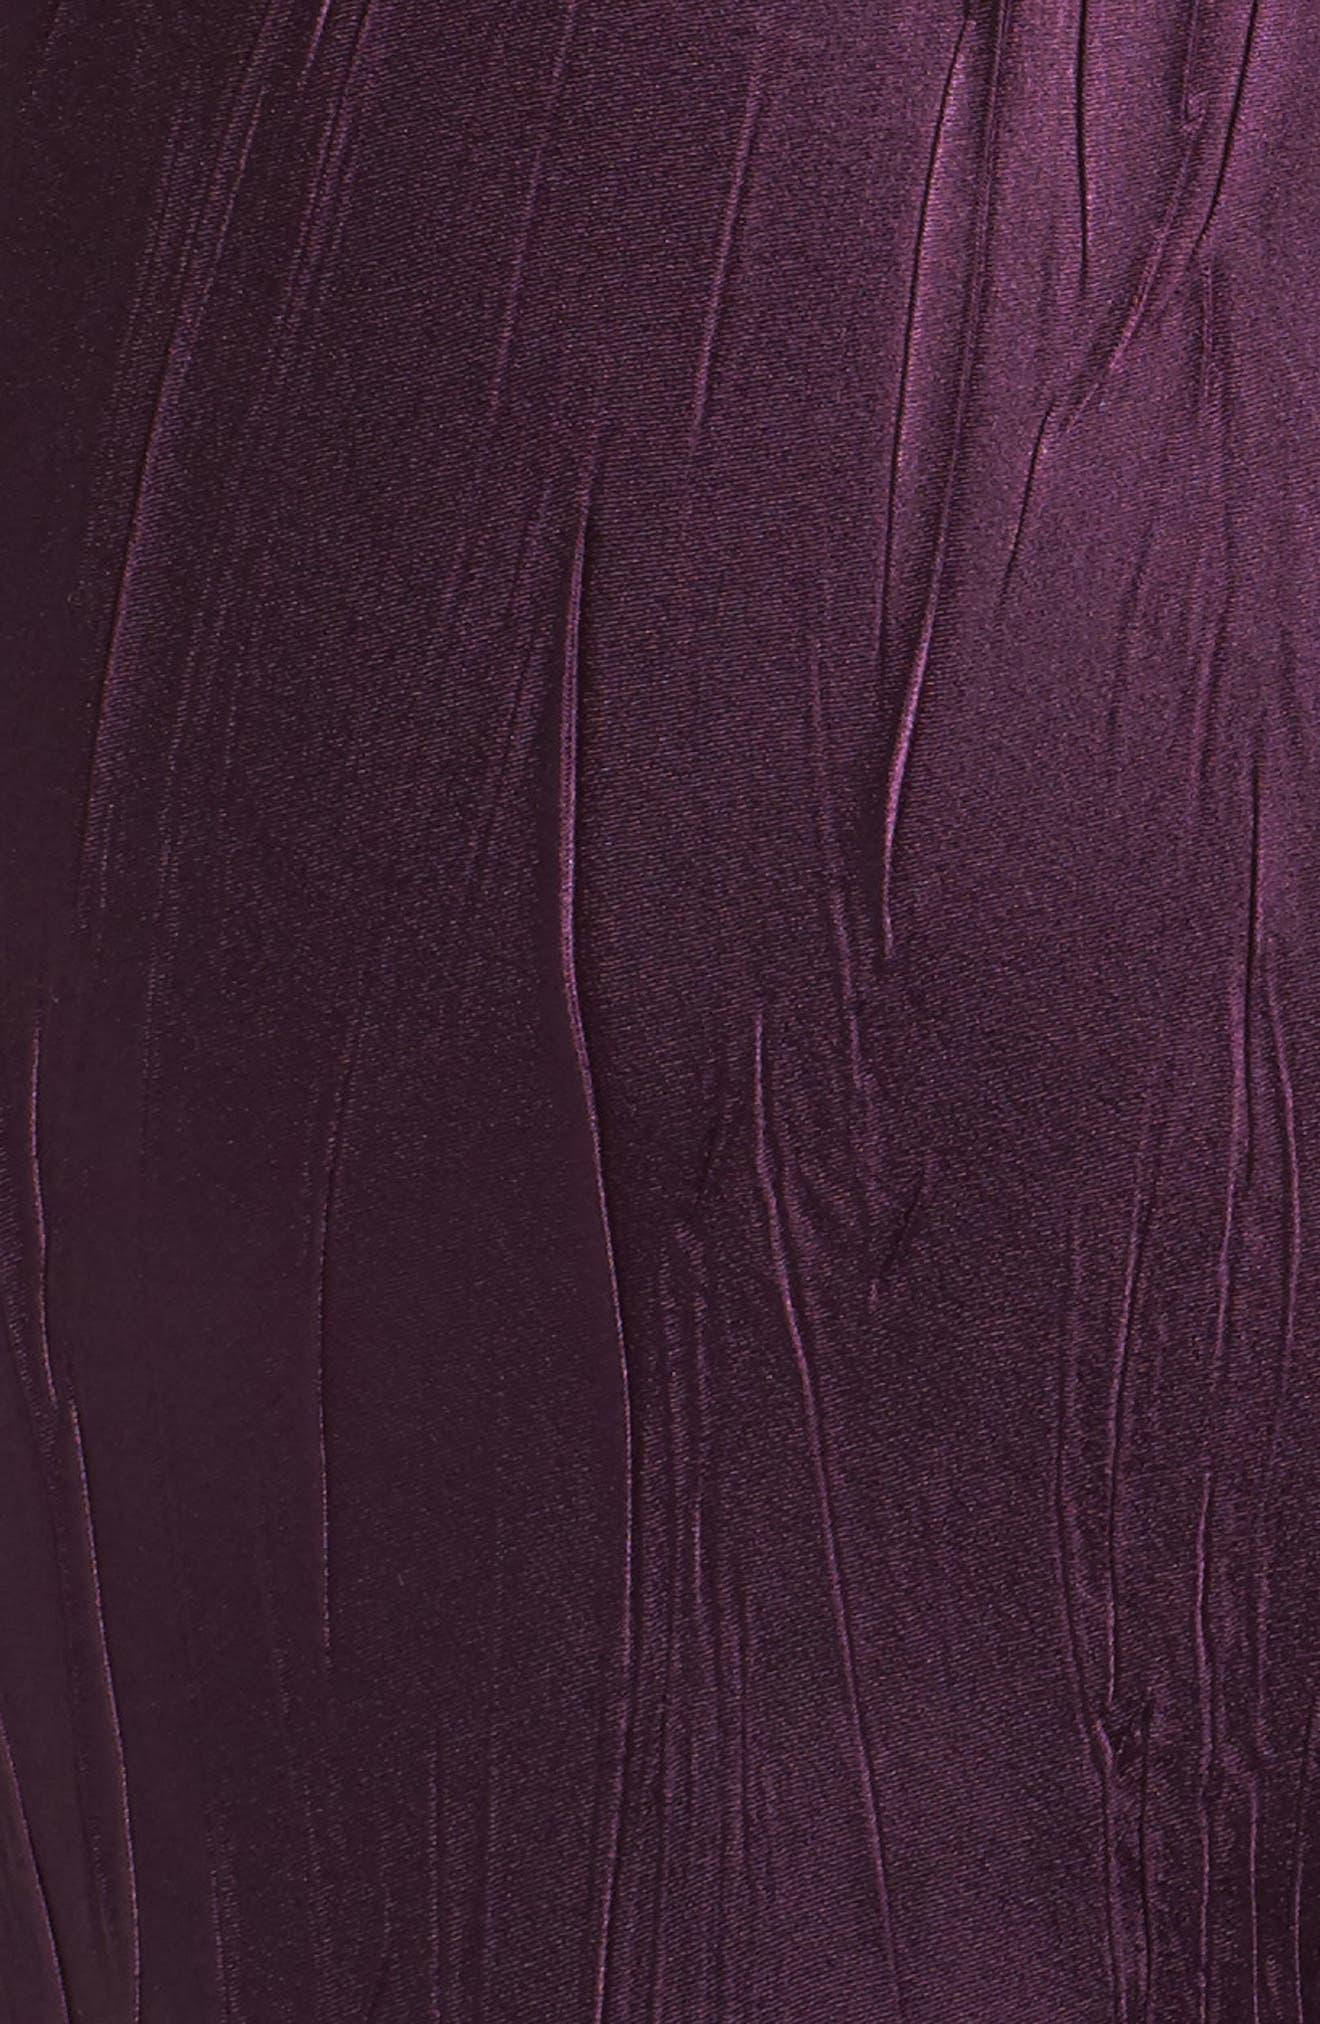 Mixed Media A-Line Dress & Jacket,                             Alternate thumbnail 4, color,                             Aubergine Night Ombre